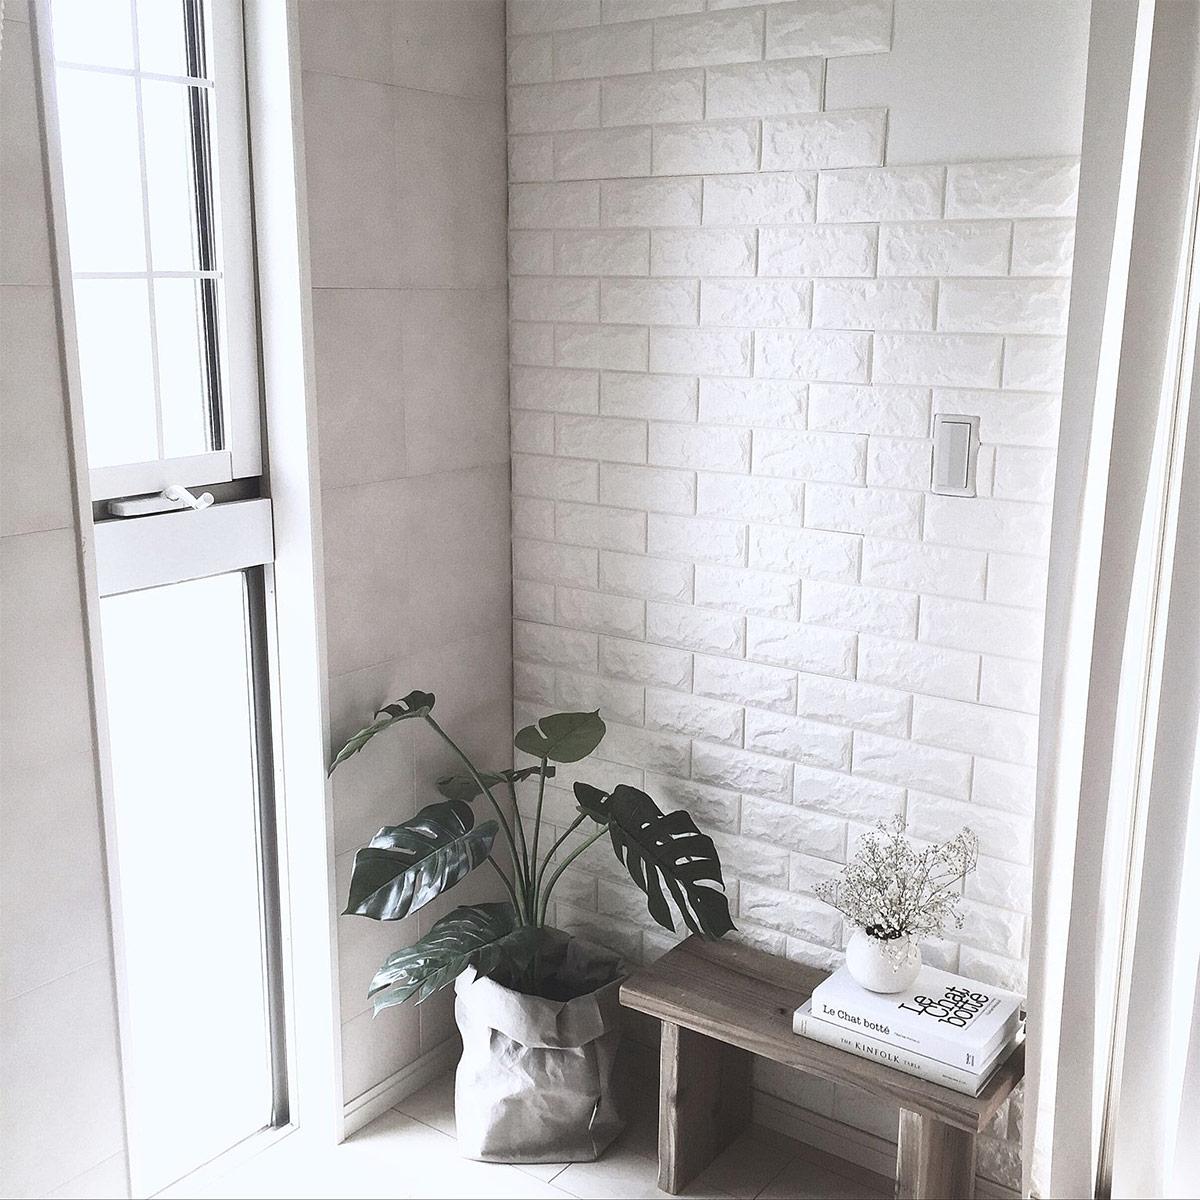 costco kitchen remodel walmart rugs cushioni 立體磚紋壁貼6入 好市多線上購物 costco厨房改造